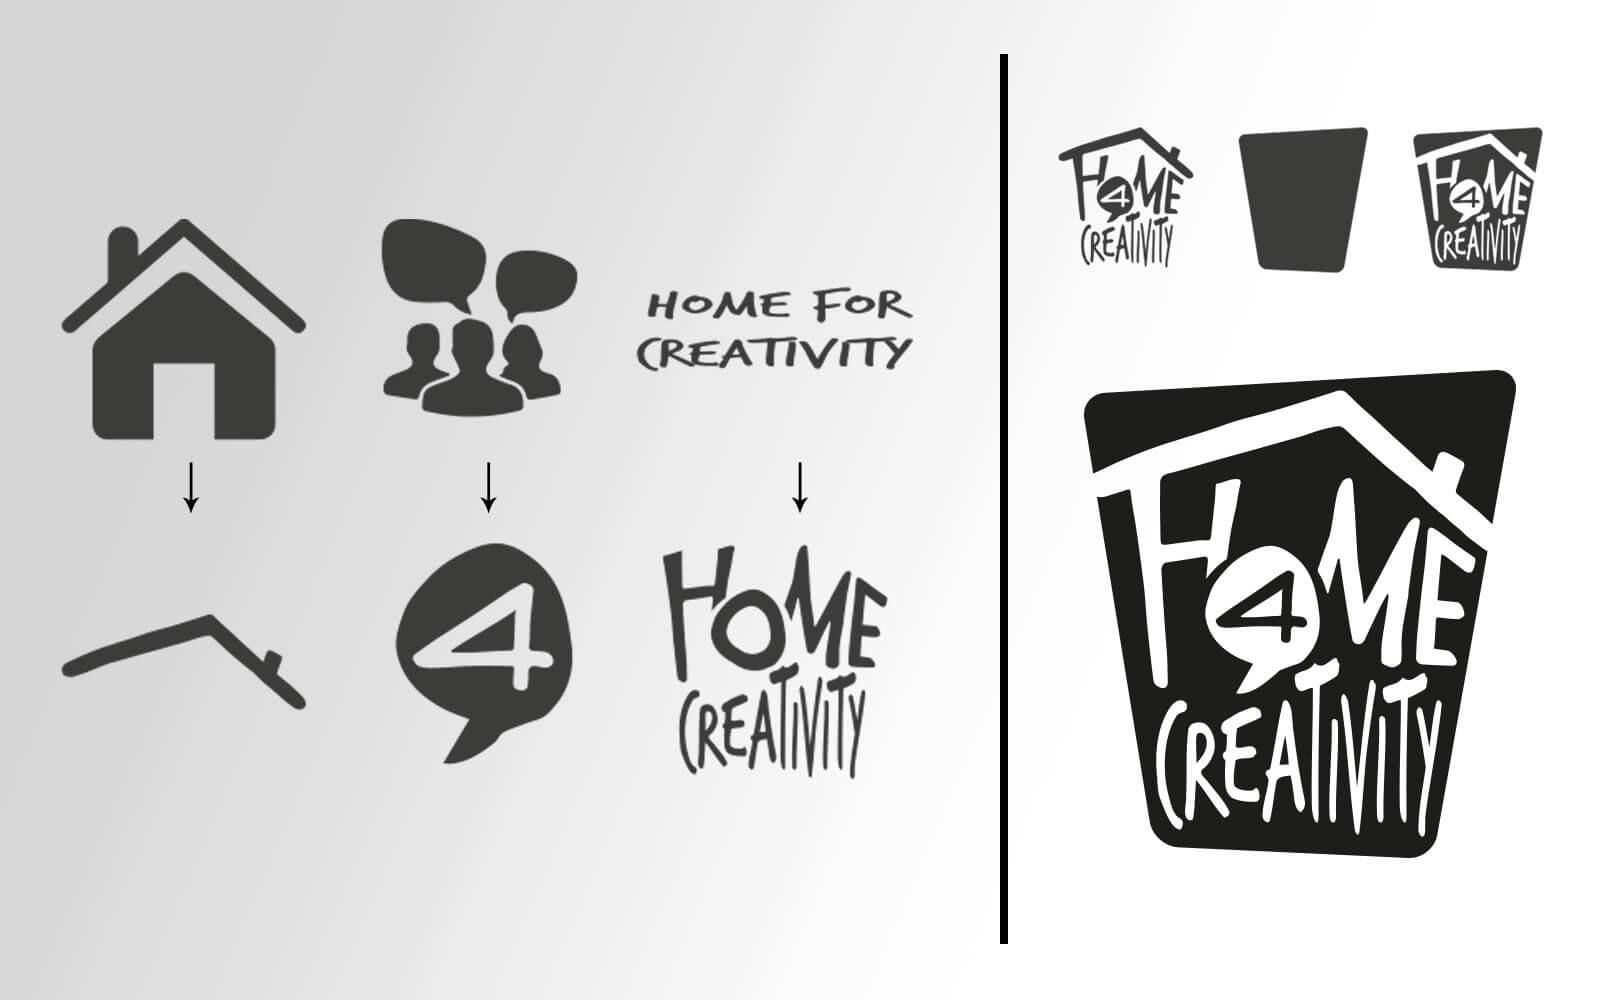 Home 4 Creativity – Brand Identity